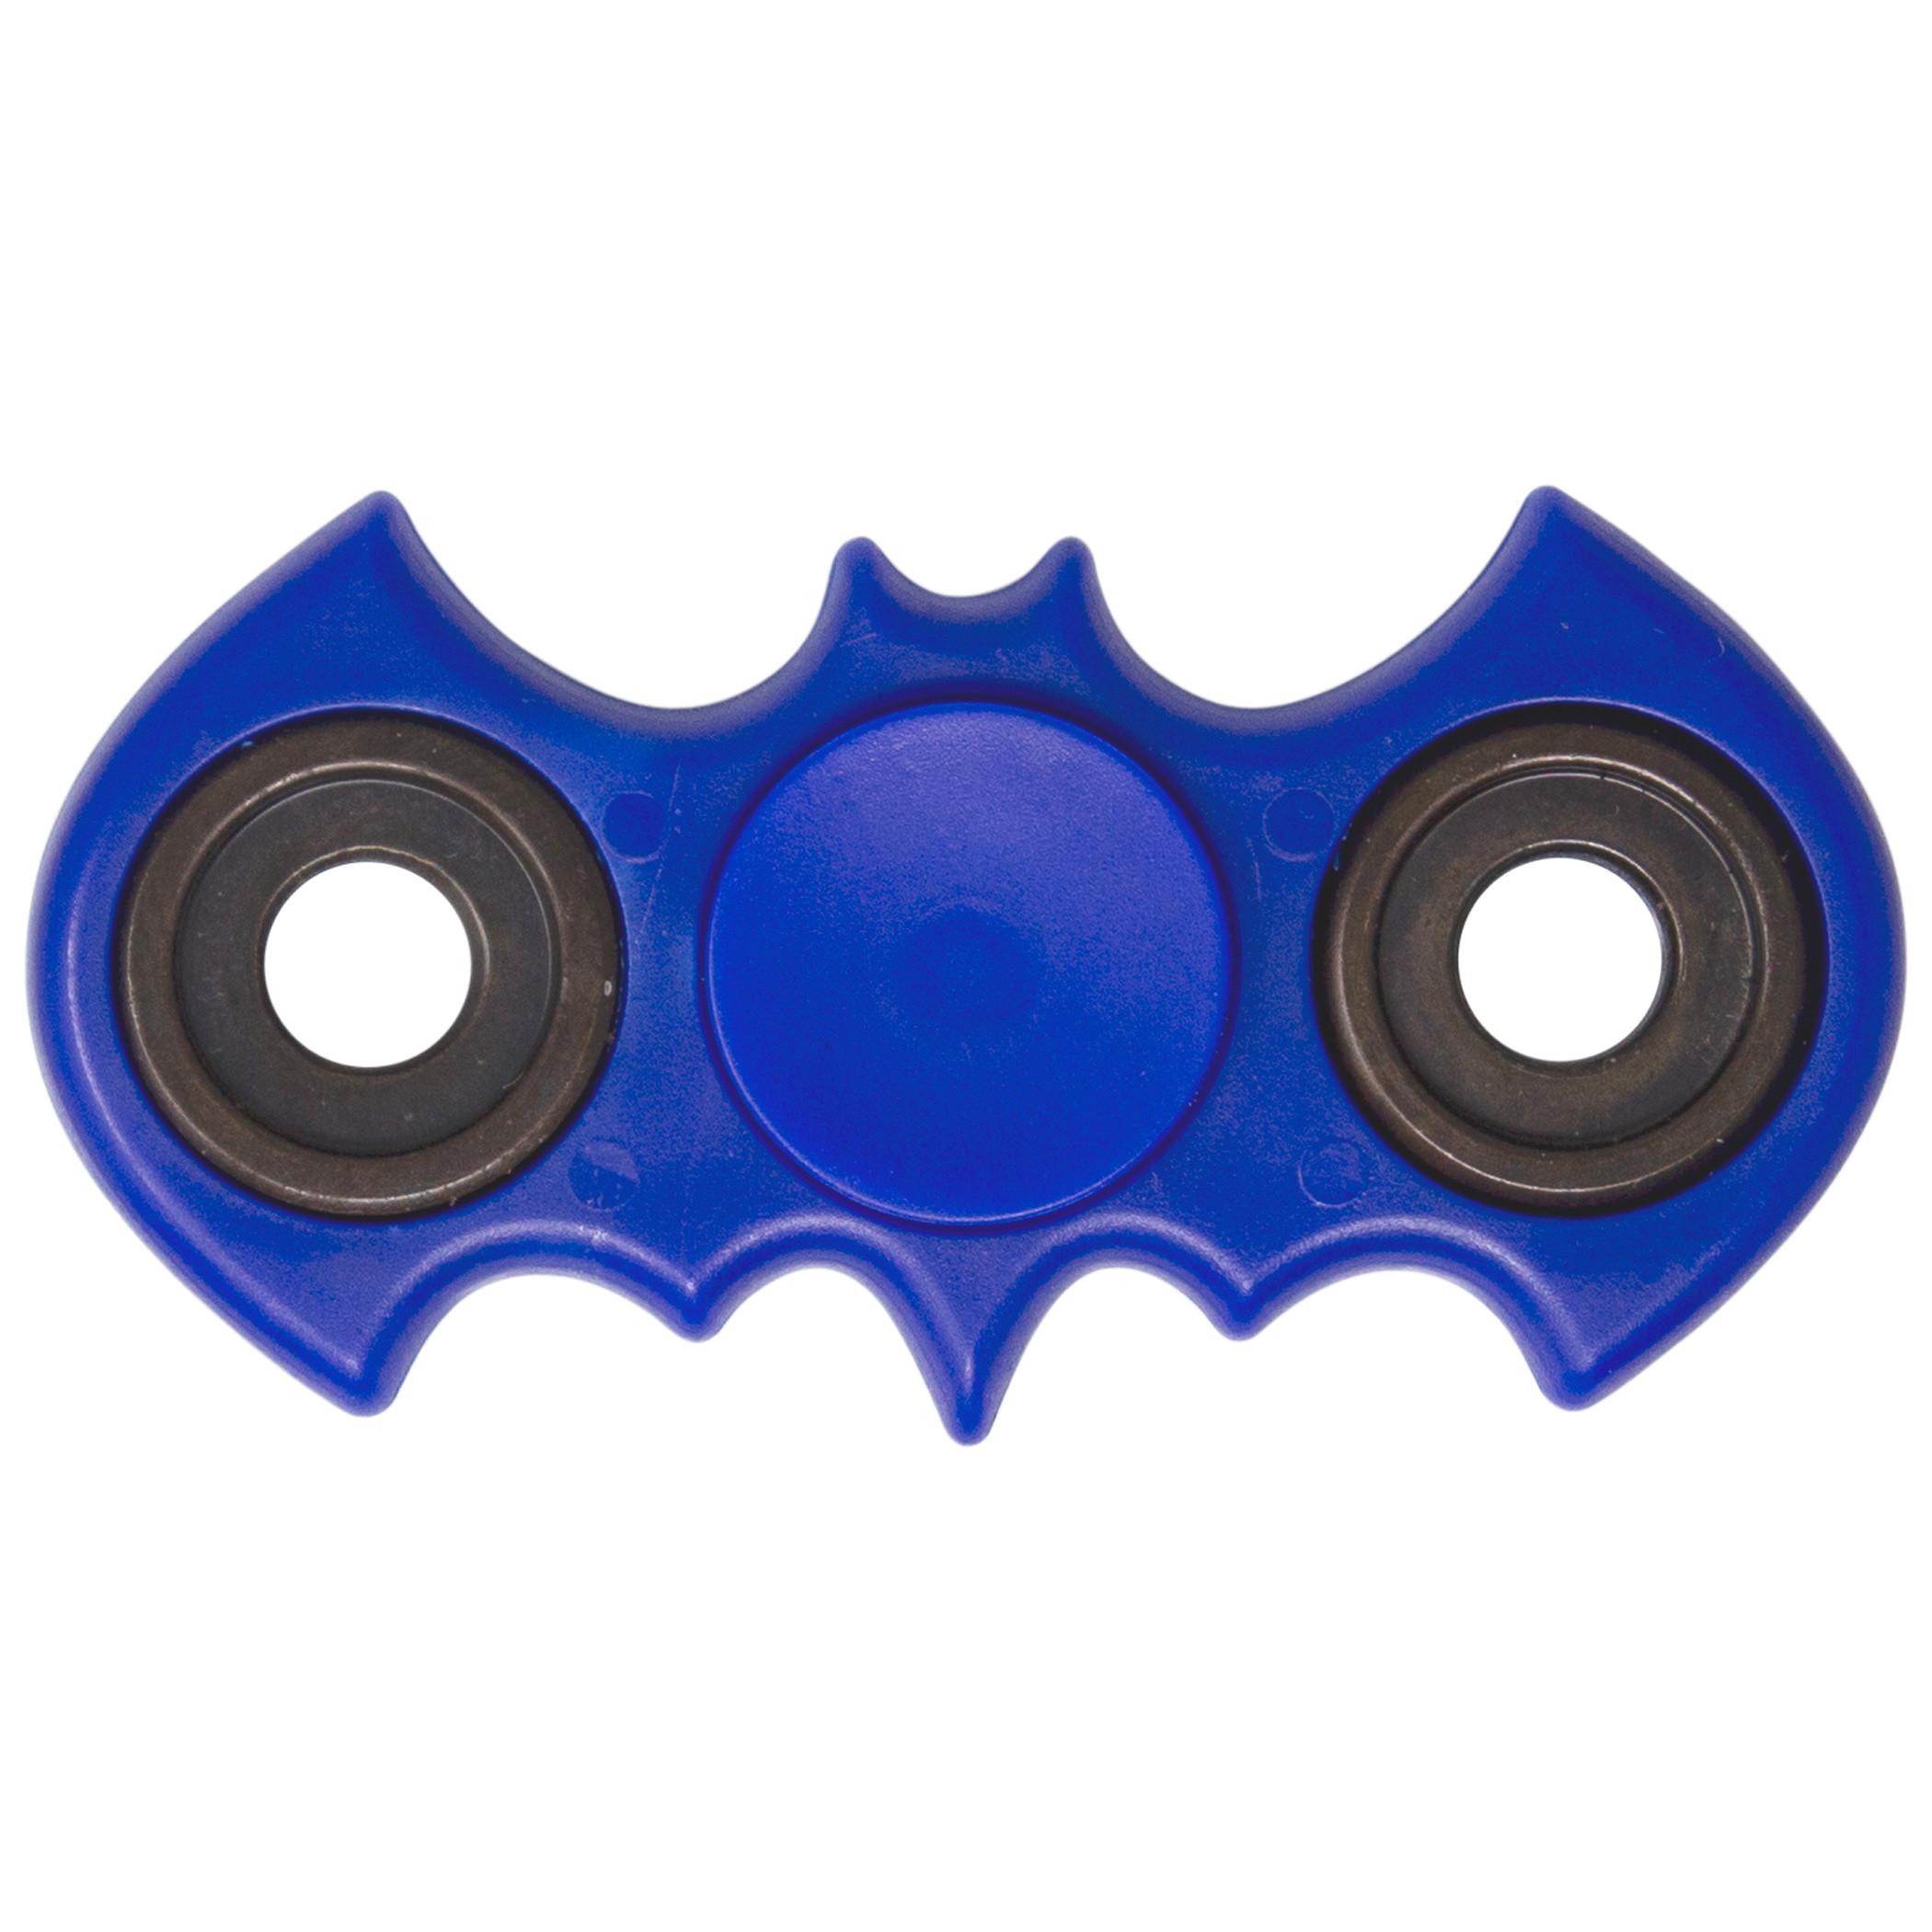 Batman Symbol Shaped Blue Fidget Spinner